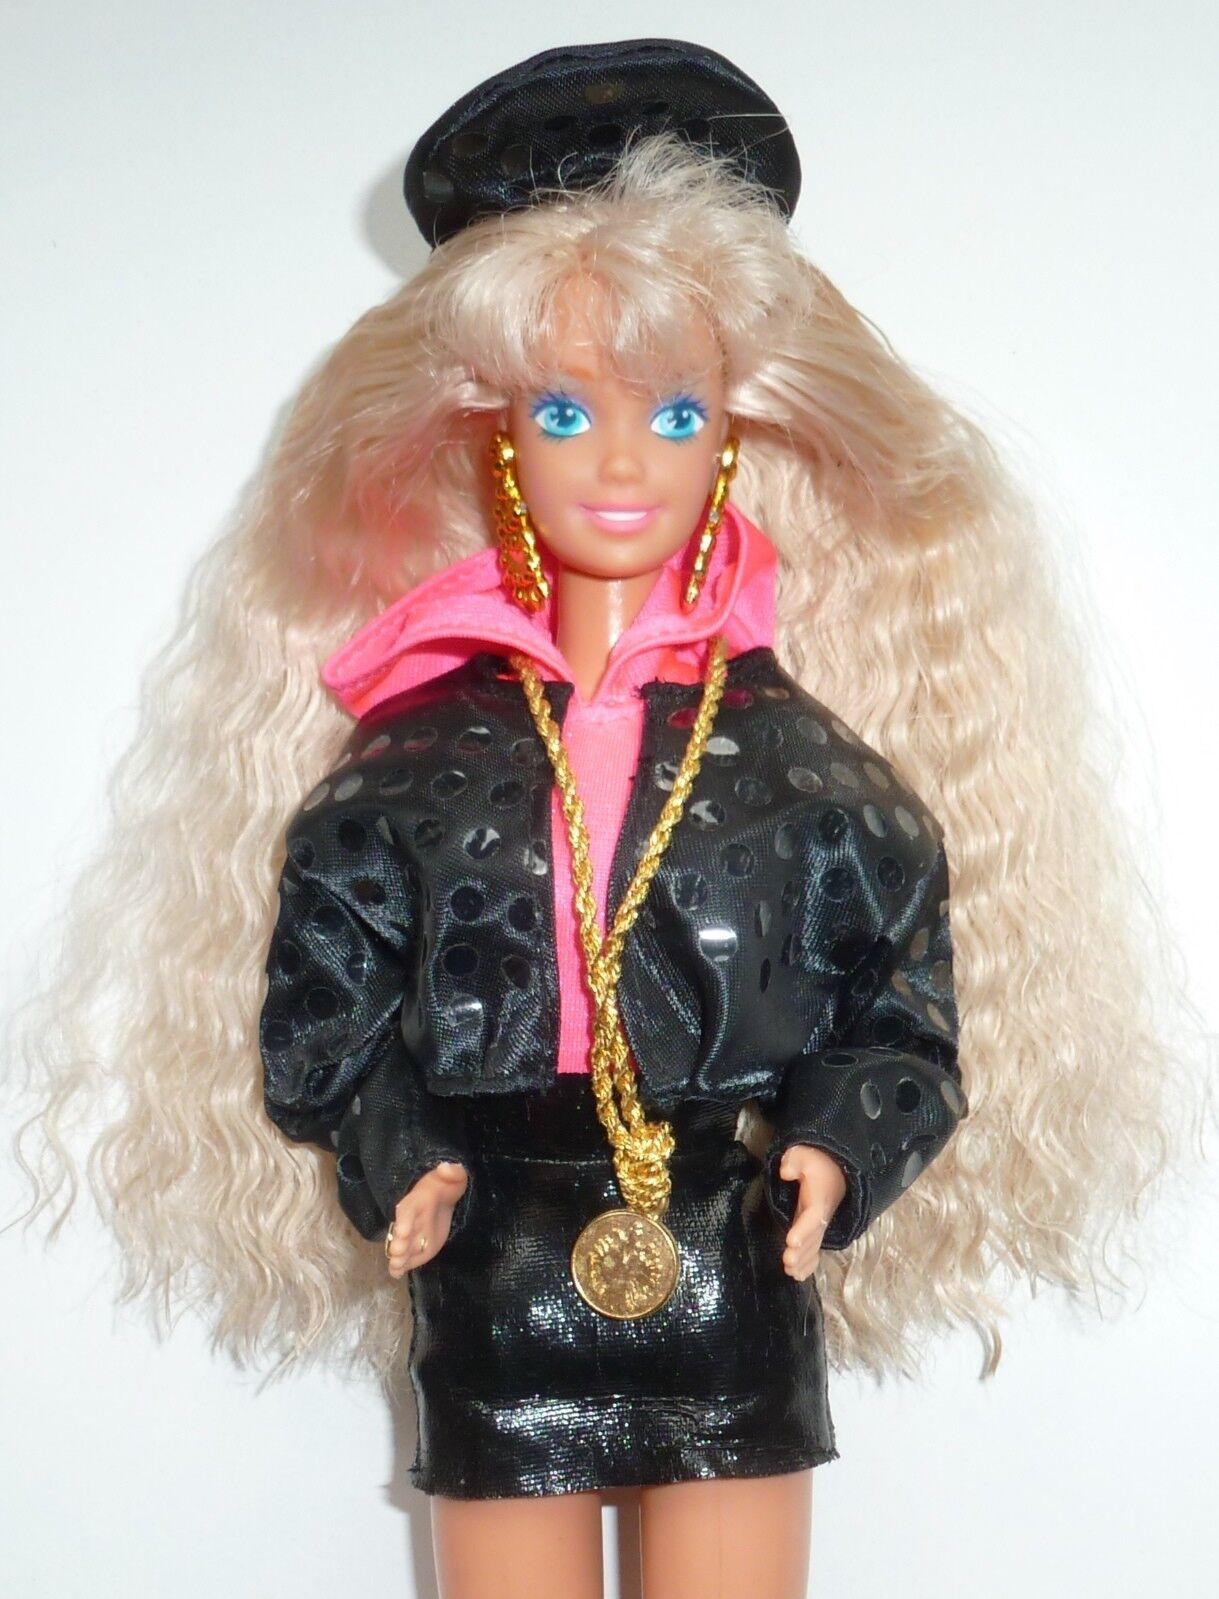 1991 Vintage Rappin Rappin Rappin Rockin Barbie Doll a2a125